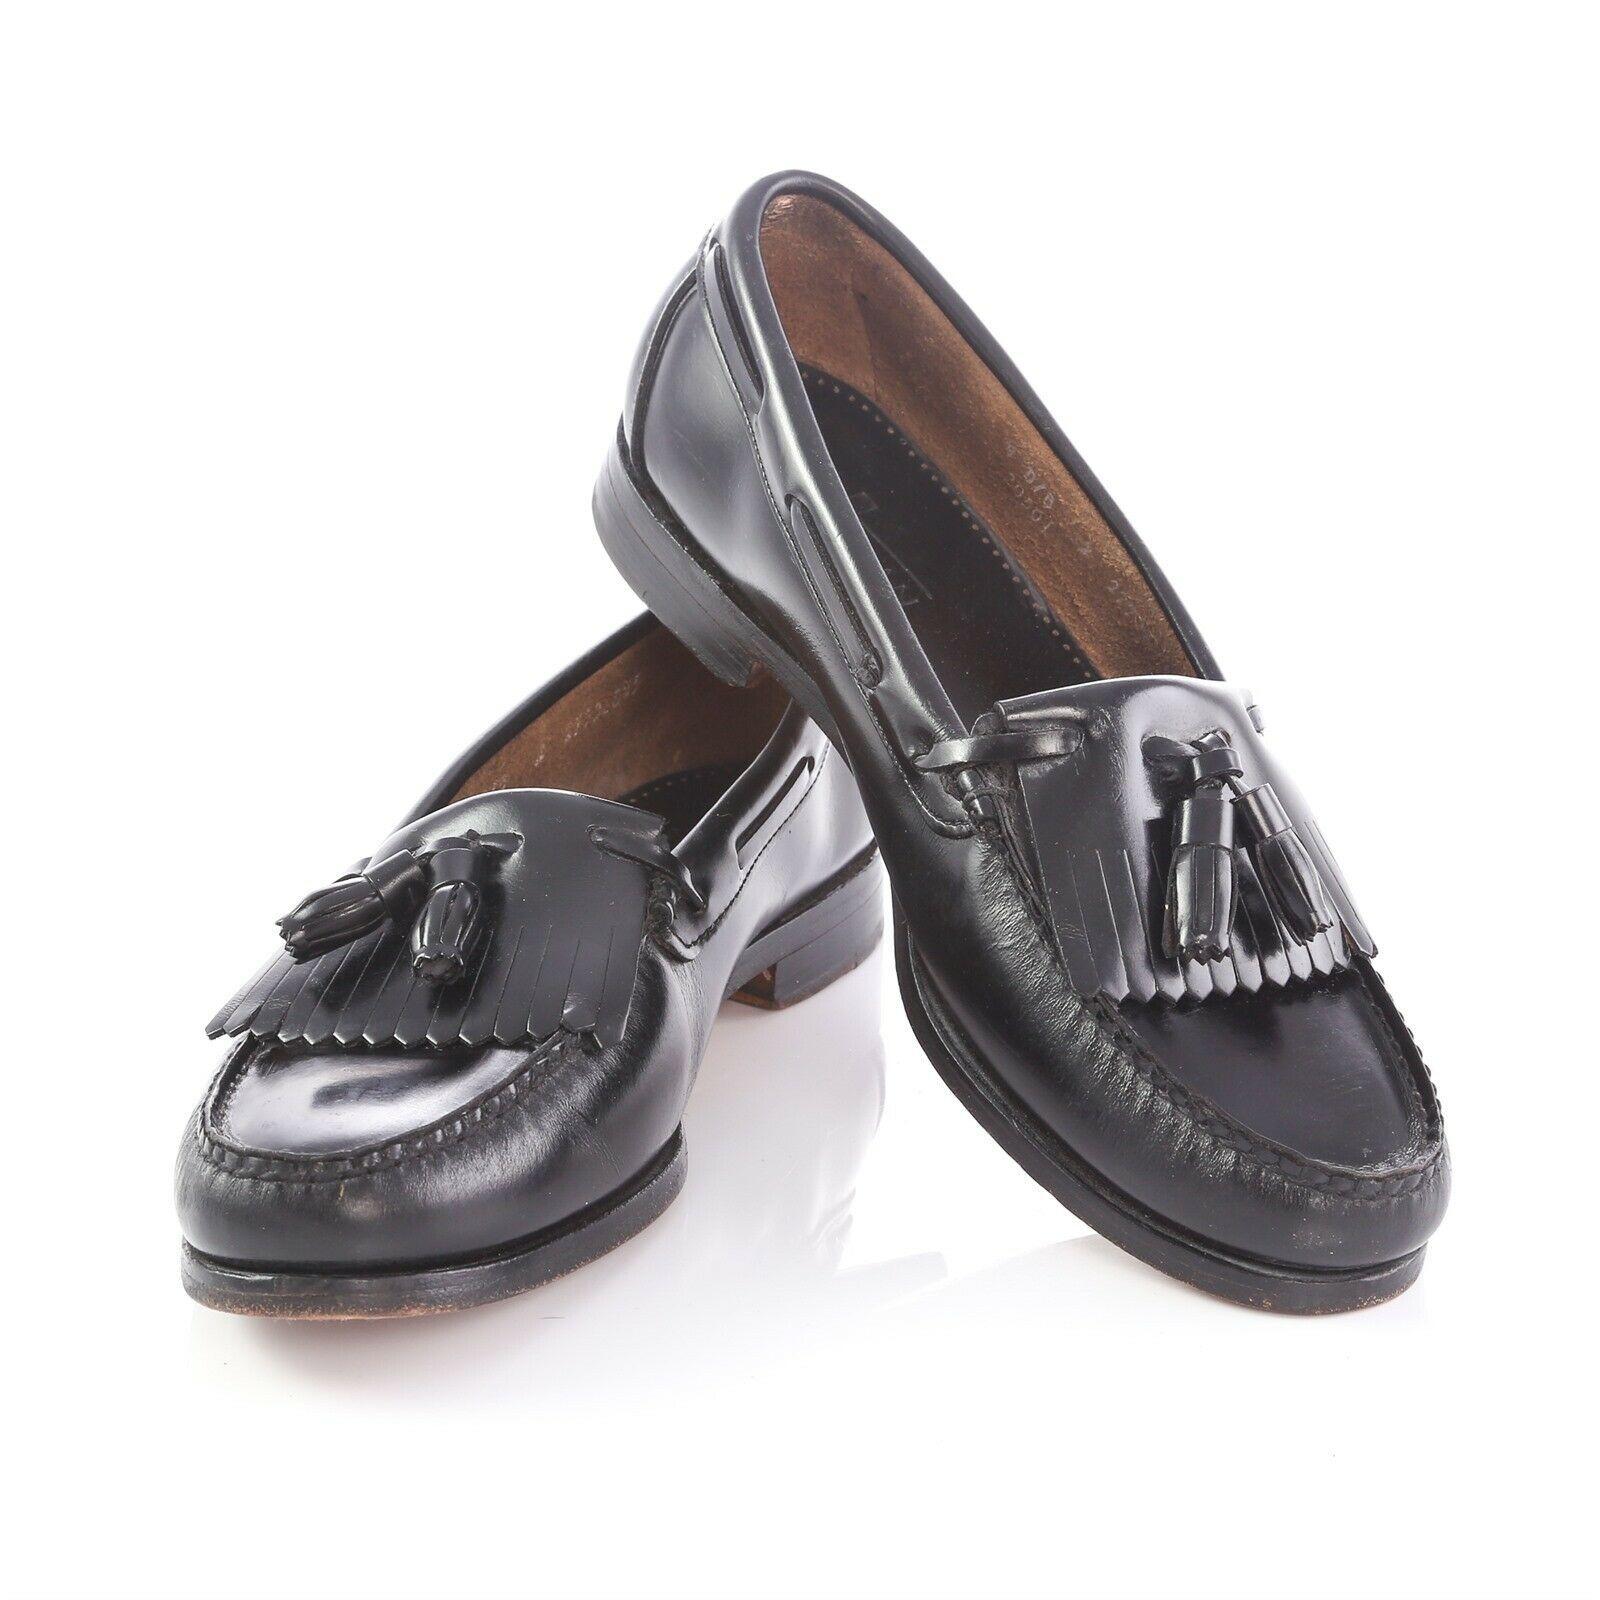 f5690d66e28 Bostonian Black Leather Kiltie Tassel Loafers Shoes Apron Toe Mens 9 Made in  USA -  34.55